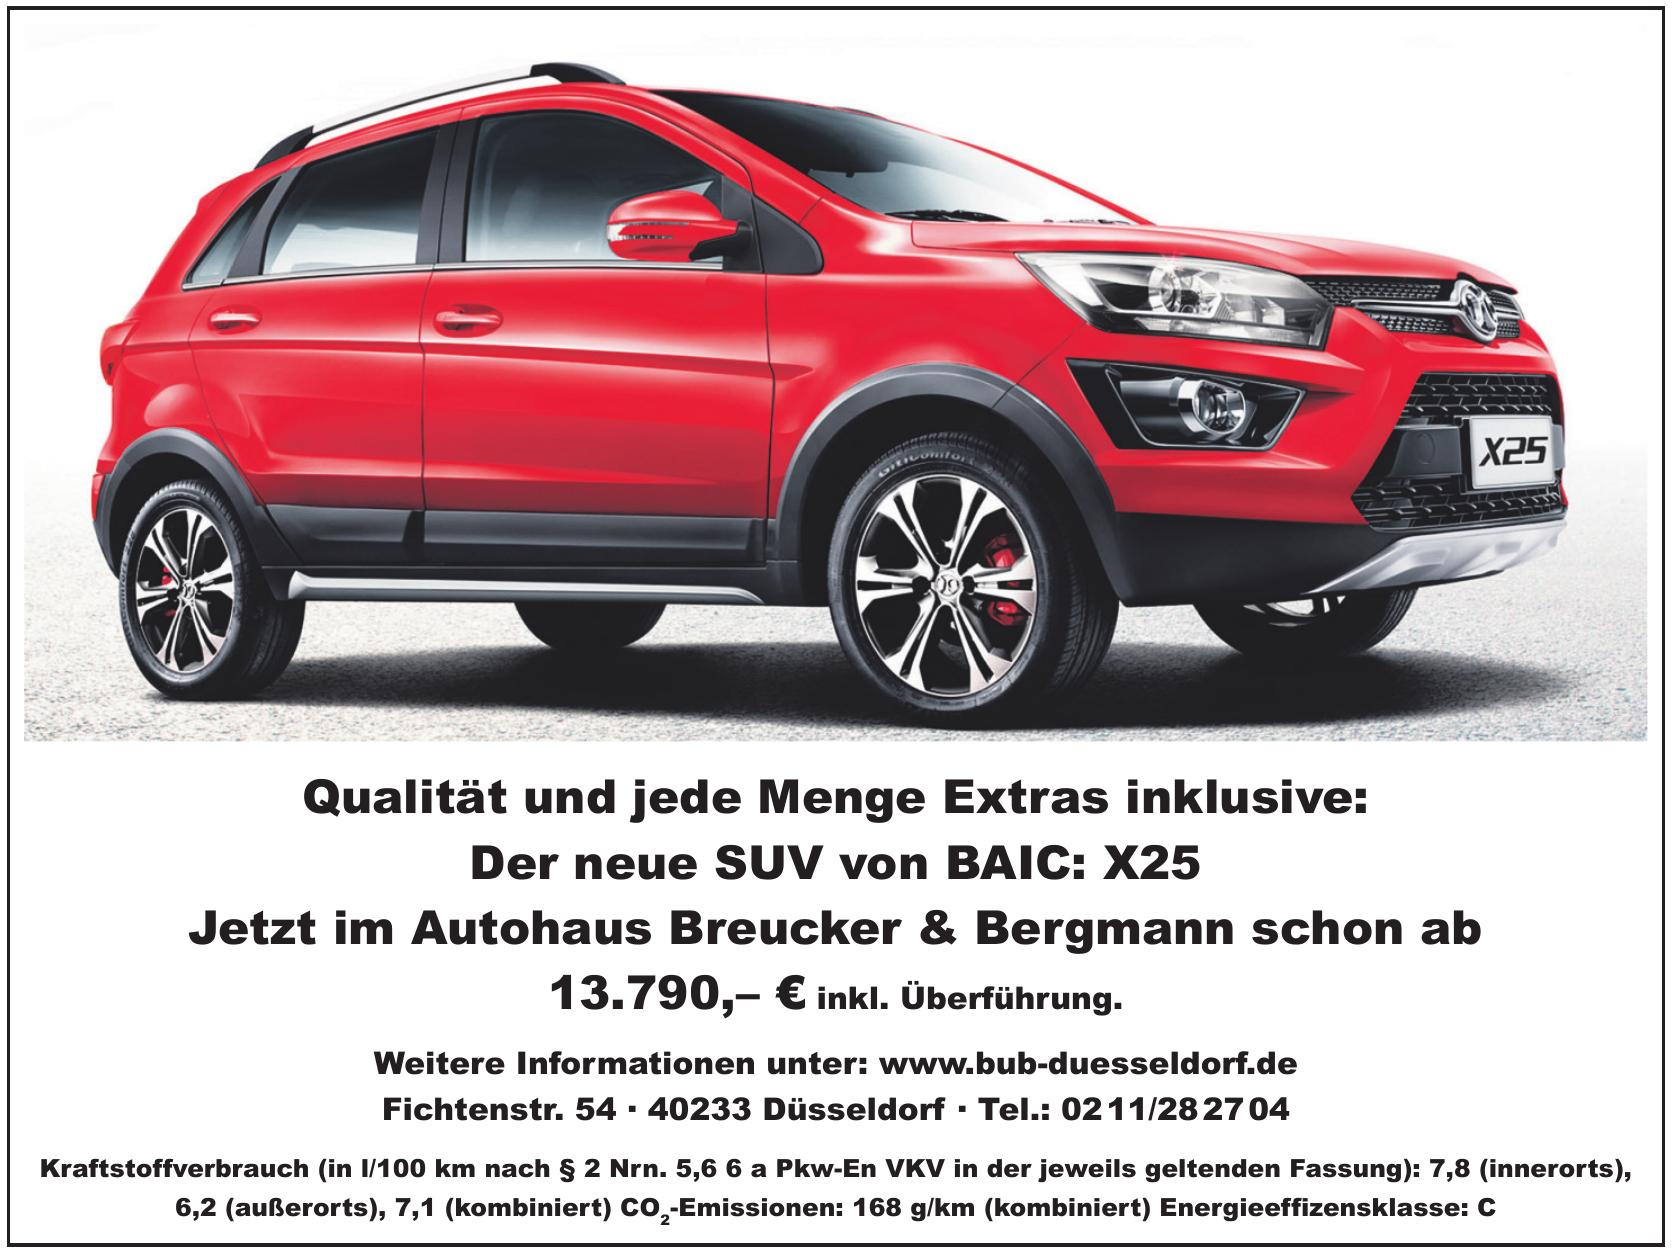 Autohaus Breucker&Bergmann